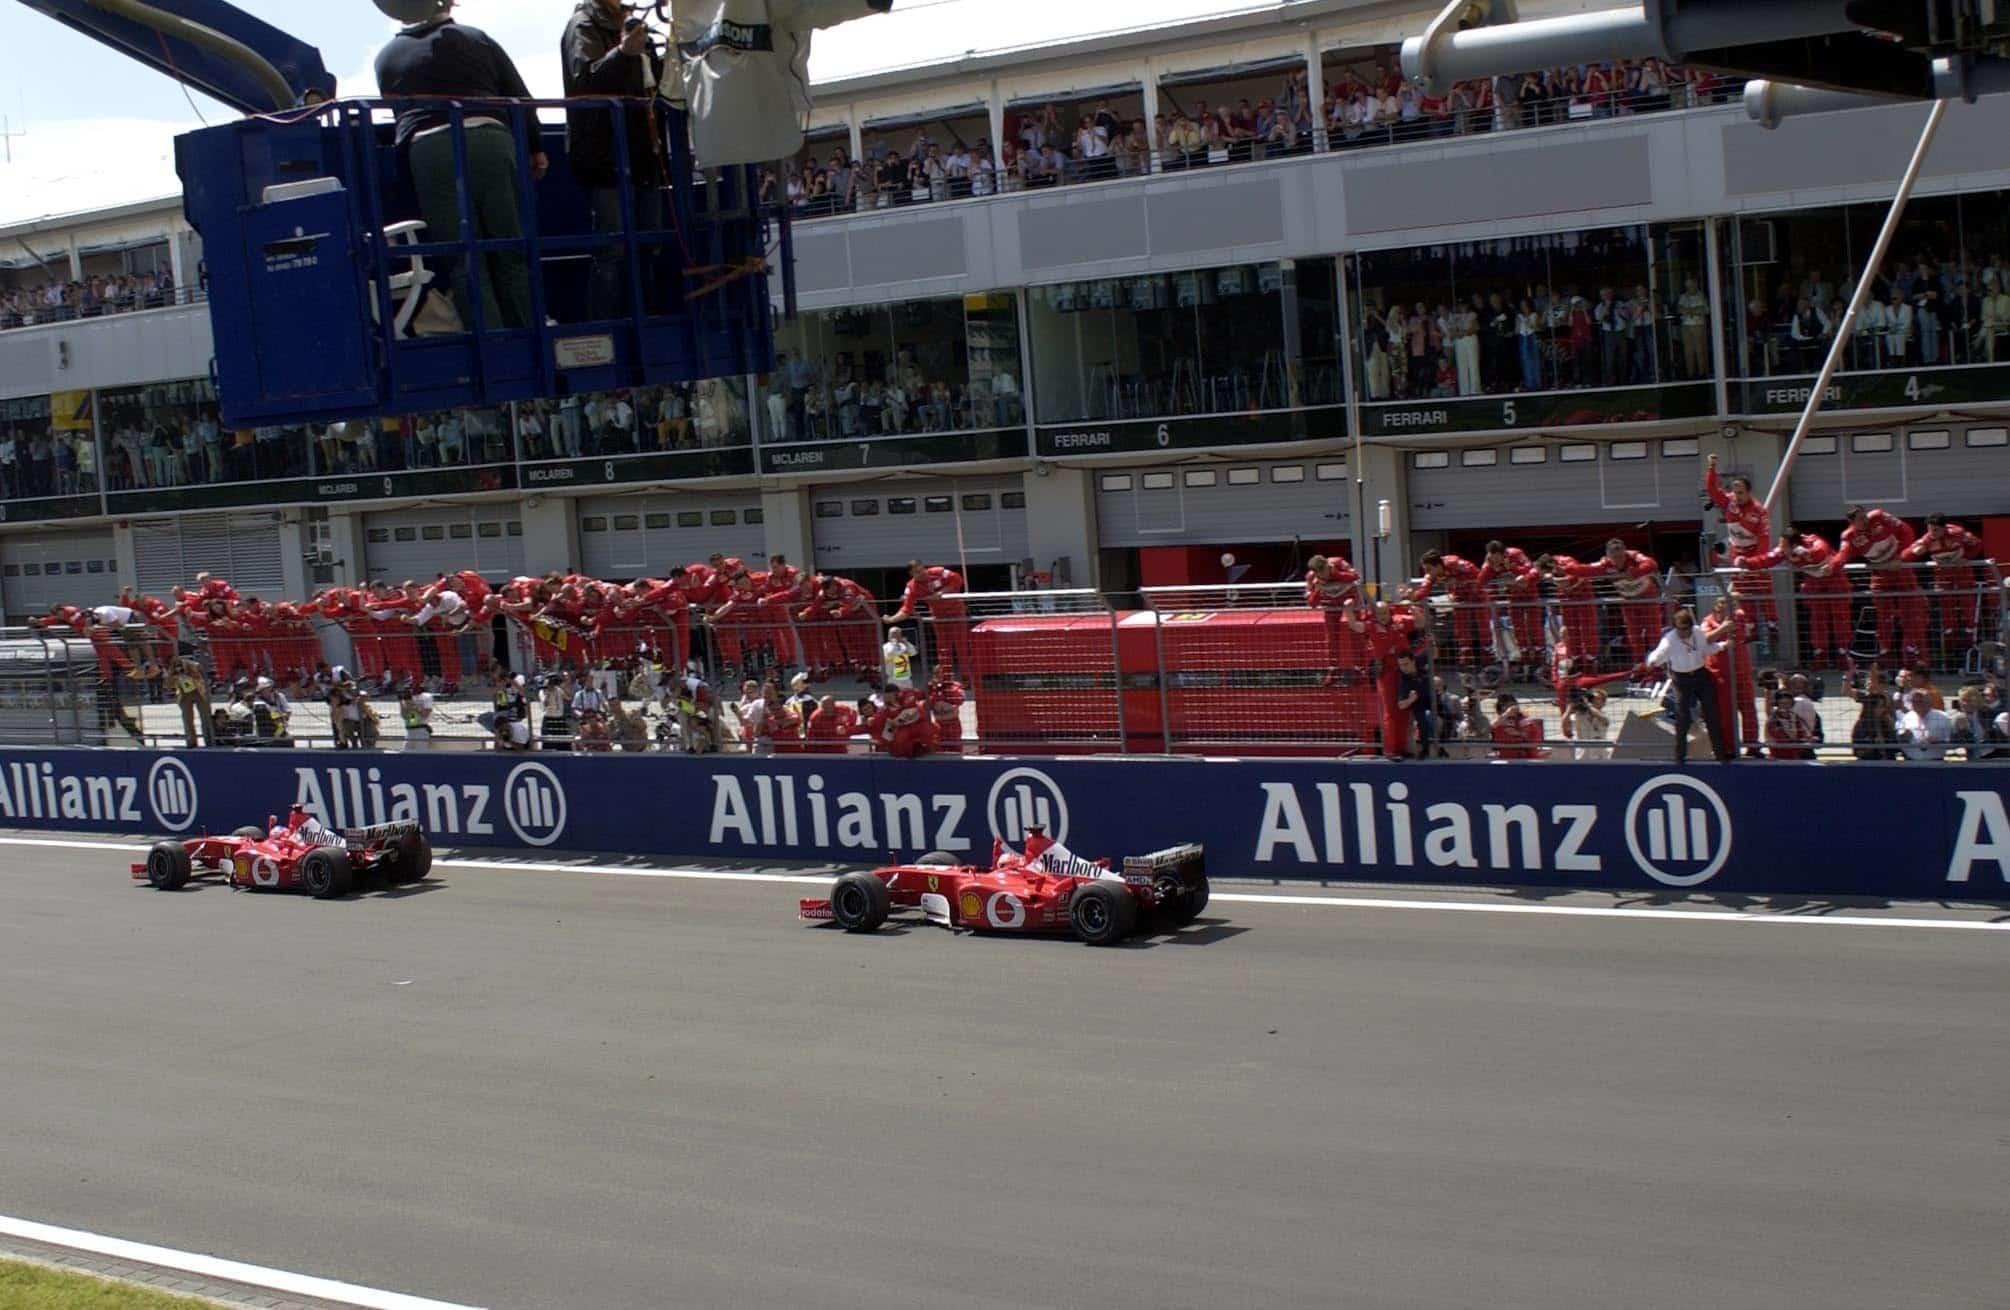 Michael Schumacher and Rubens Barrichello Ferrari F2002 European GP F1 2002 Nurburgring Photo Ferrari